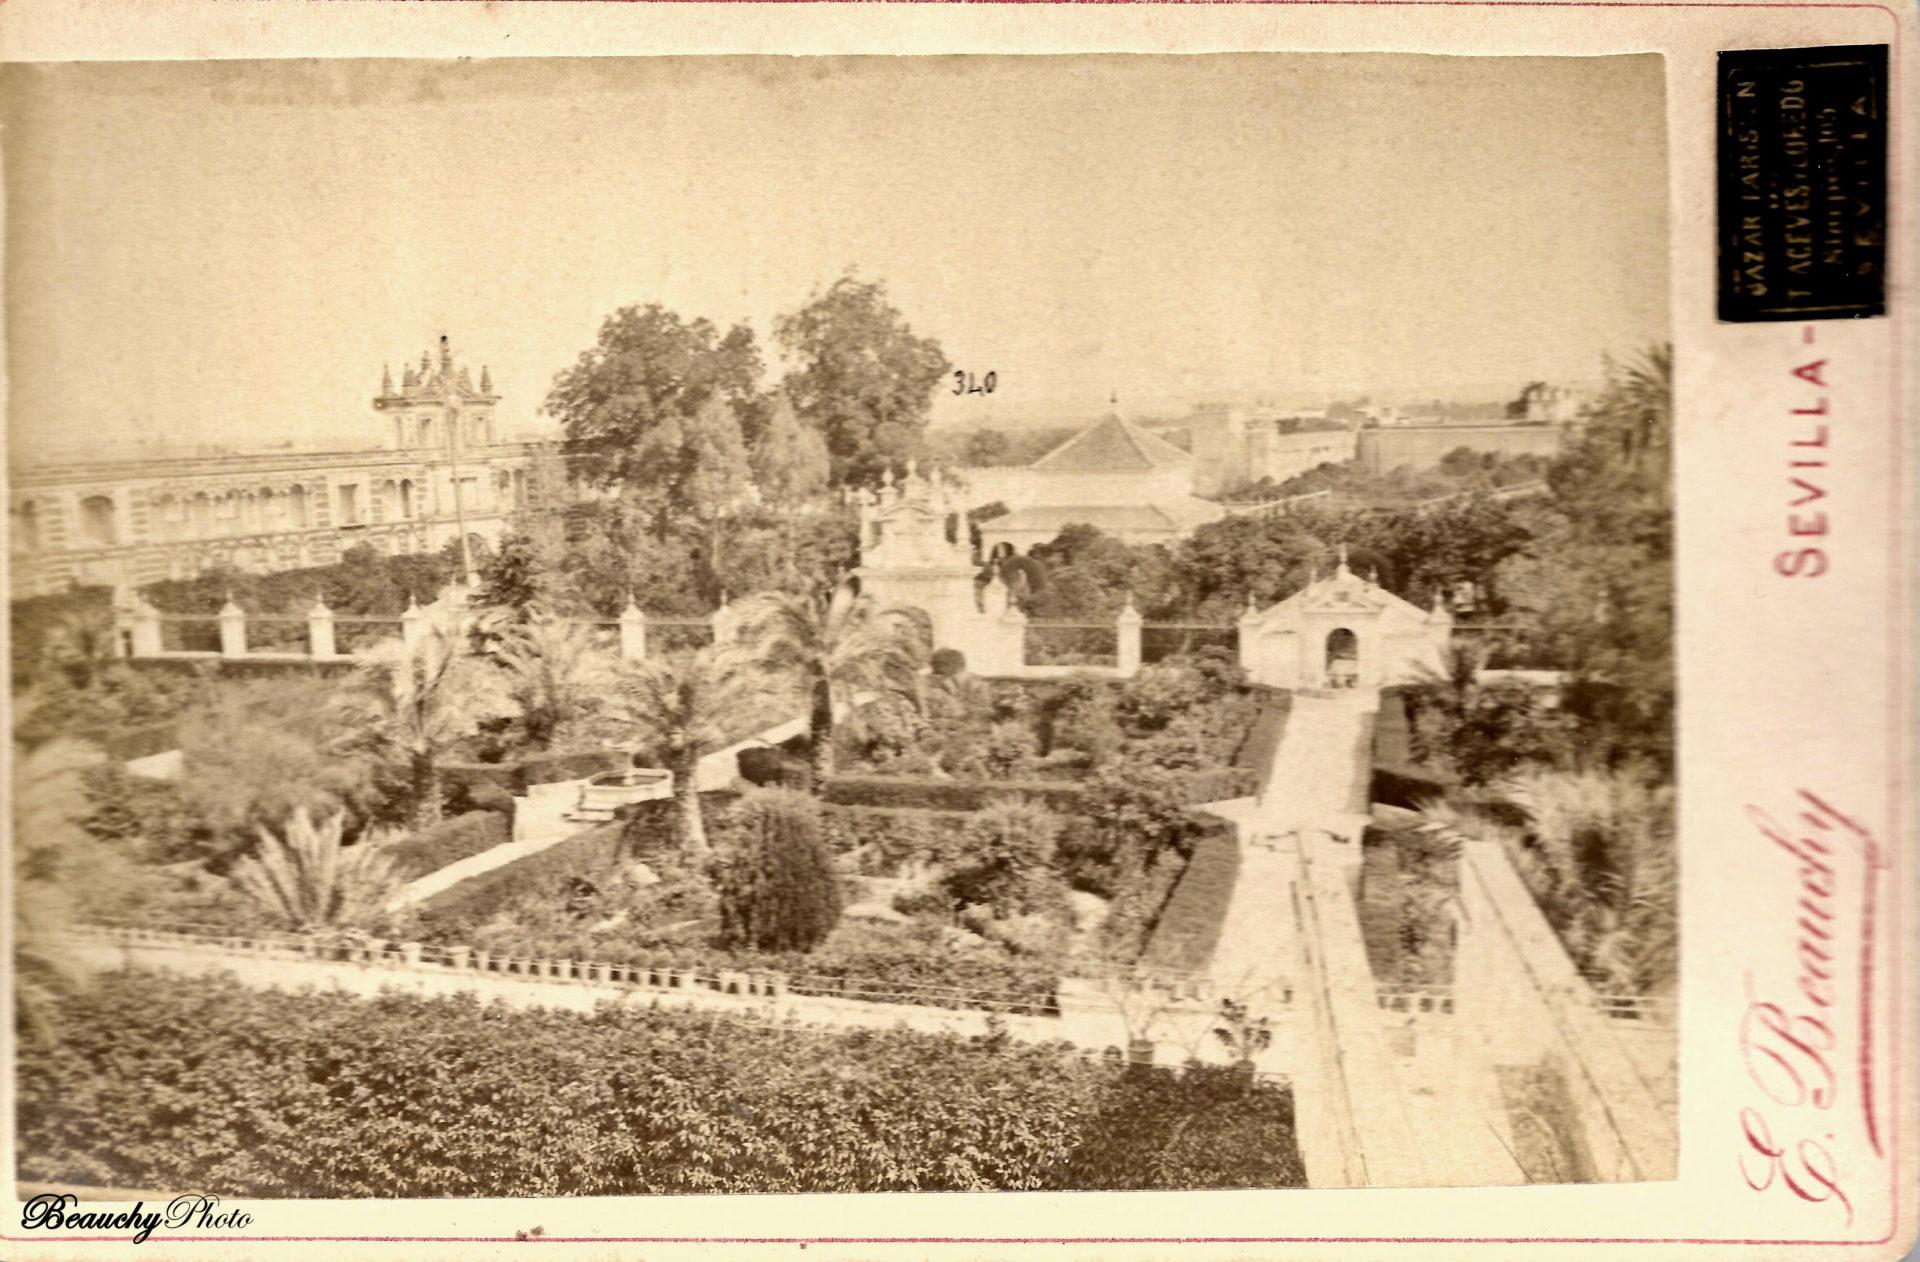 Vista aérea de los Jardines del Alcázar de Sevilla